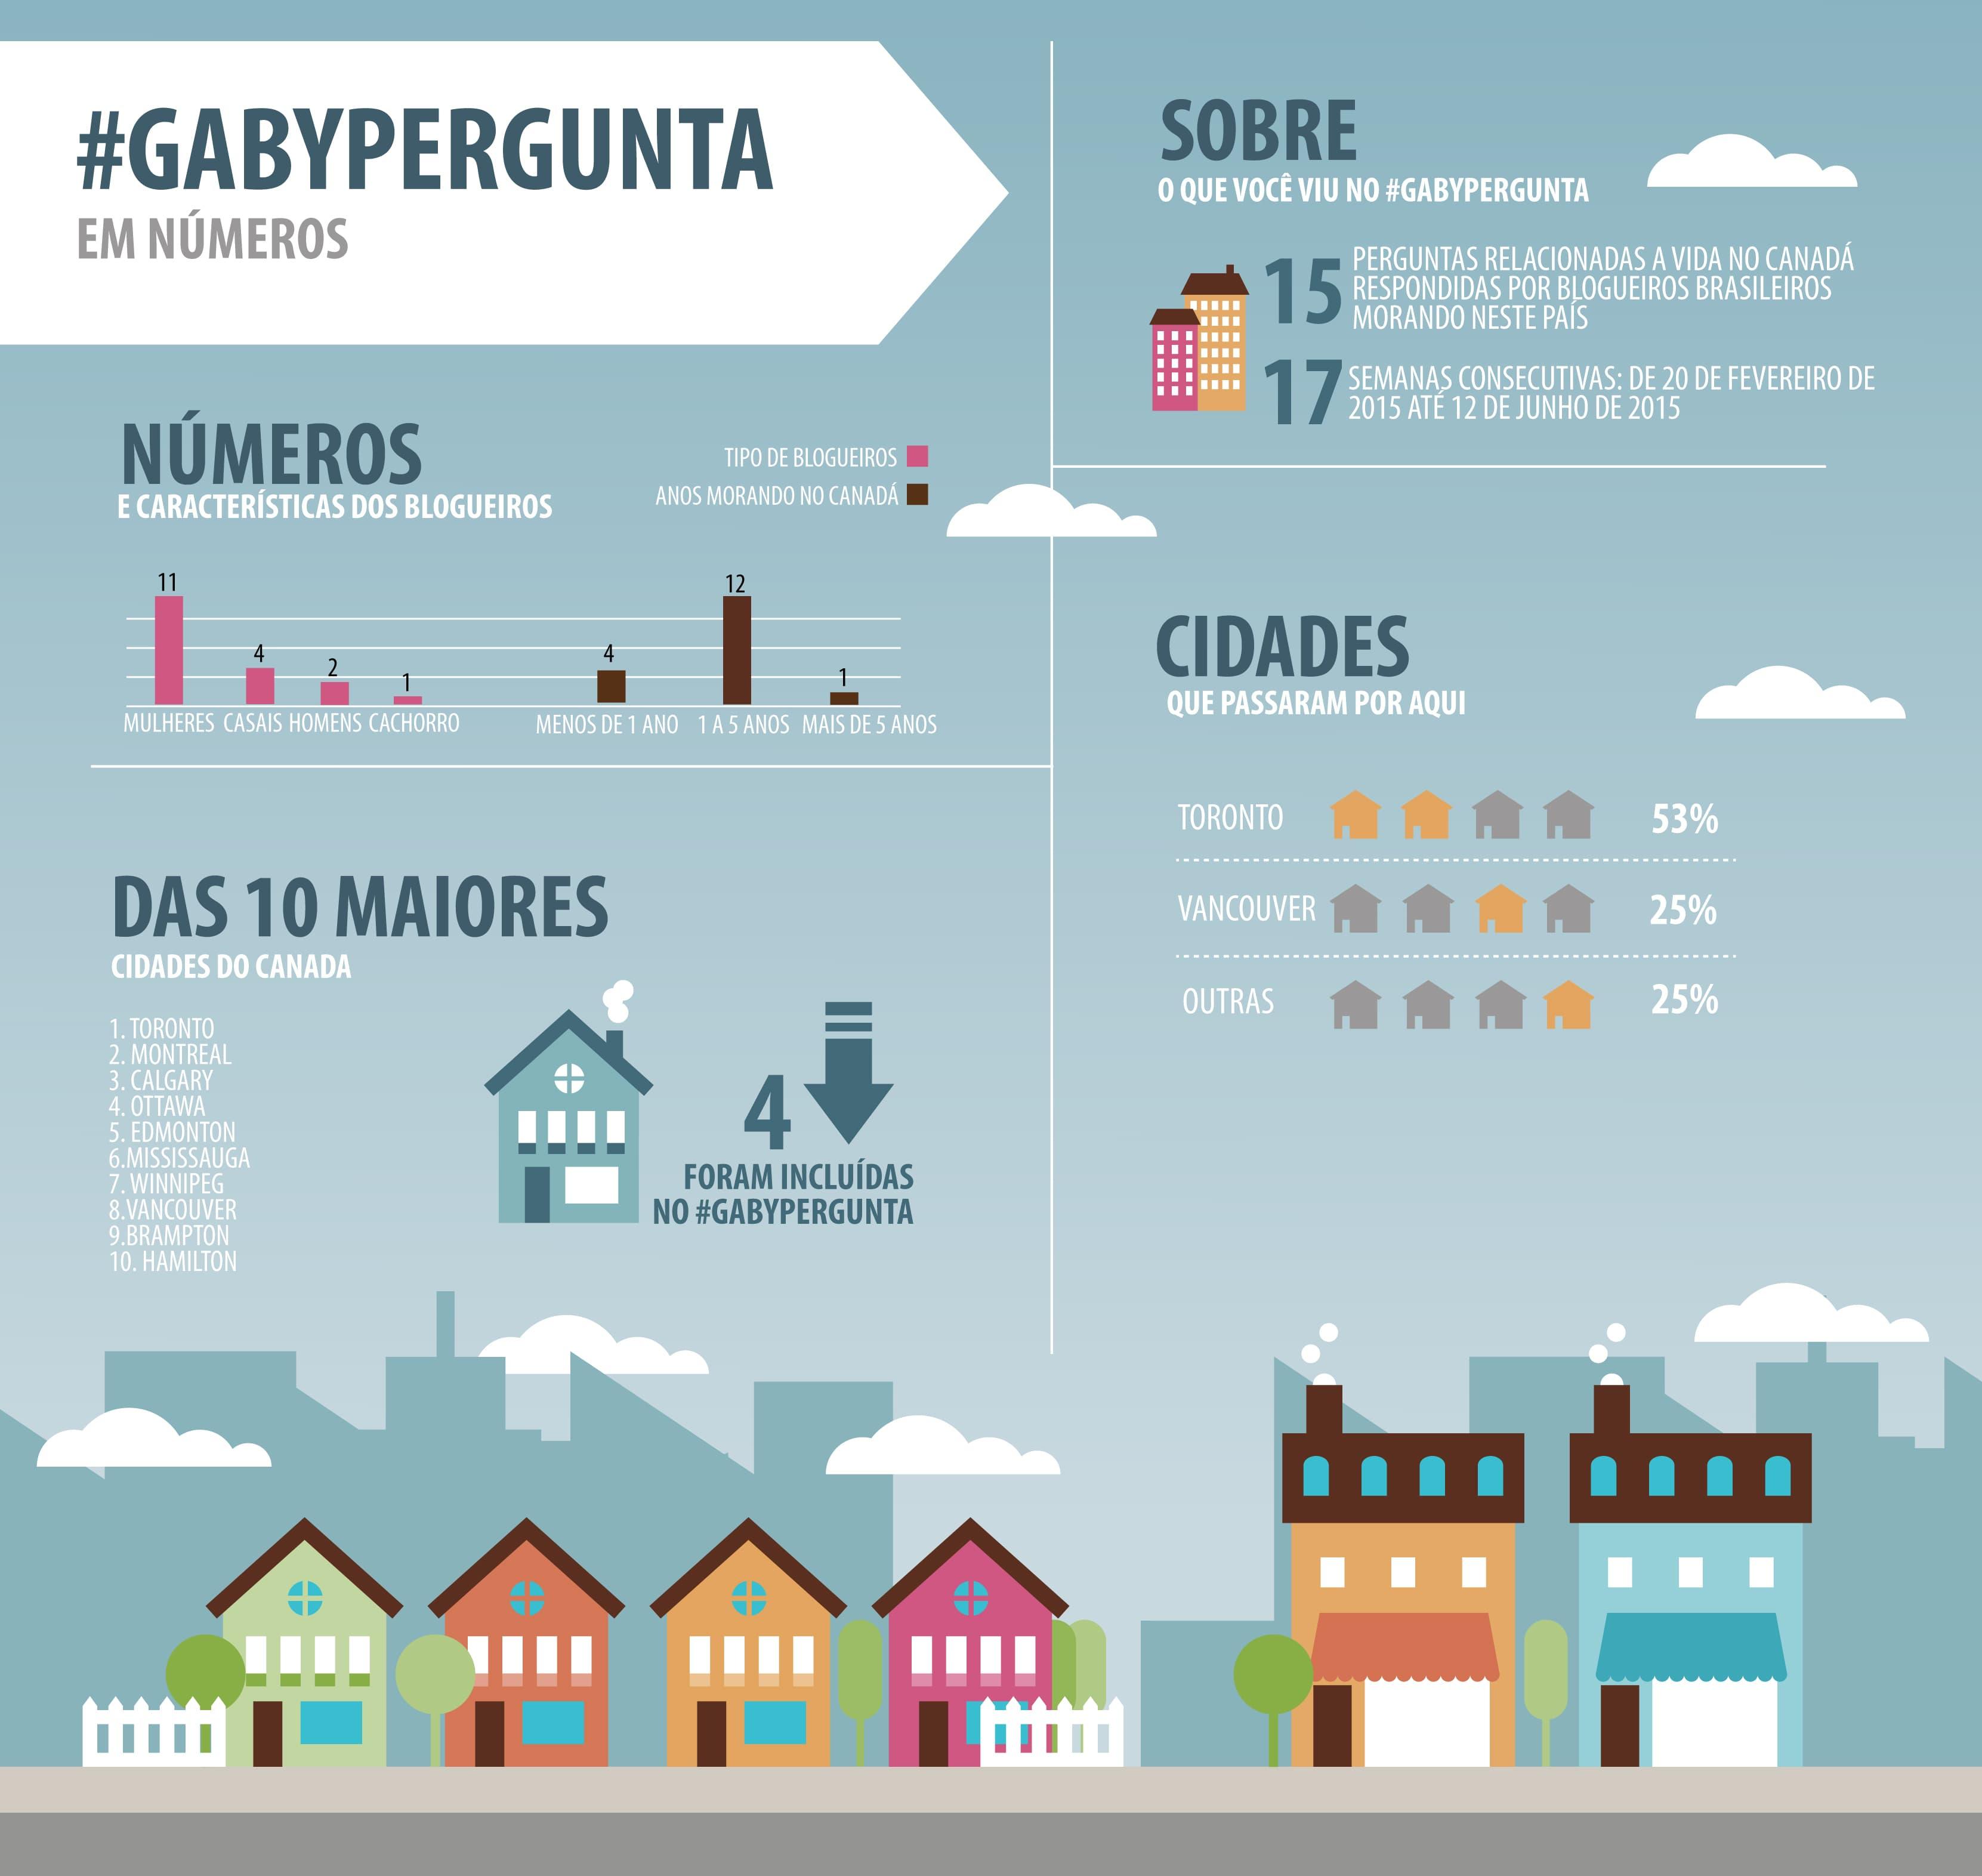 GabyPergunta